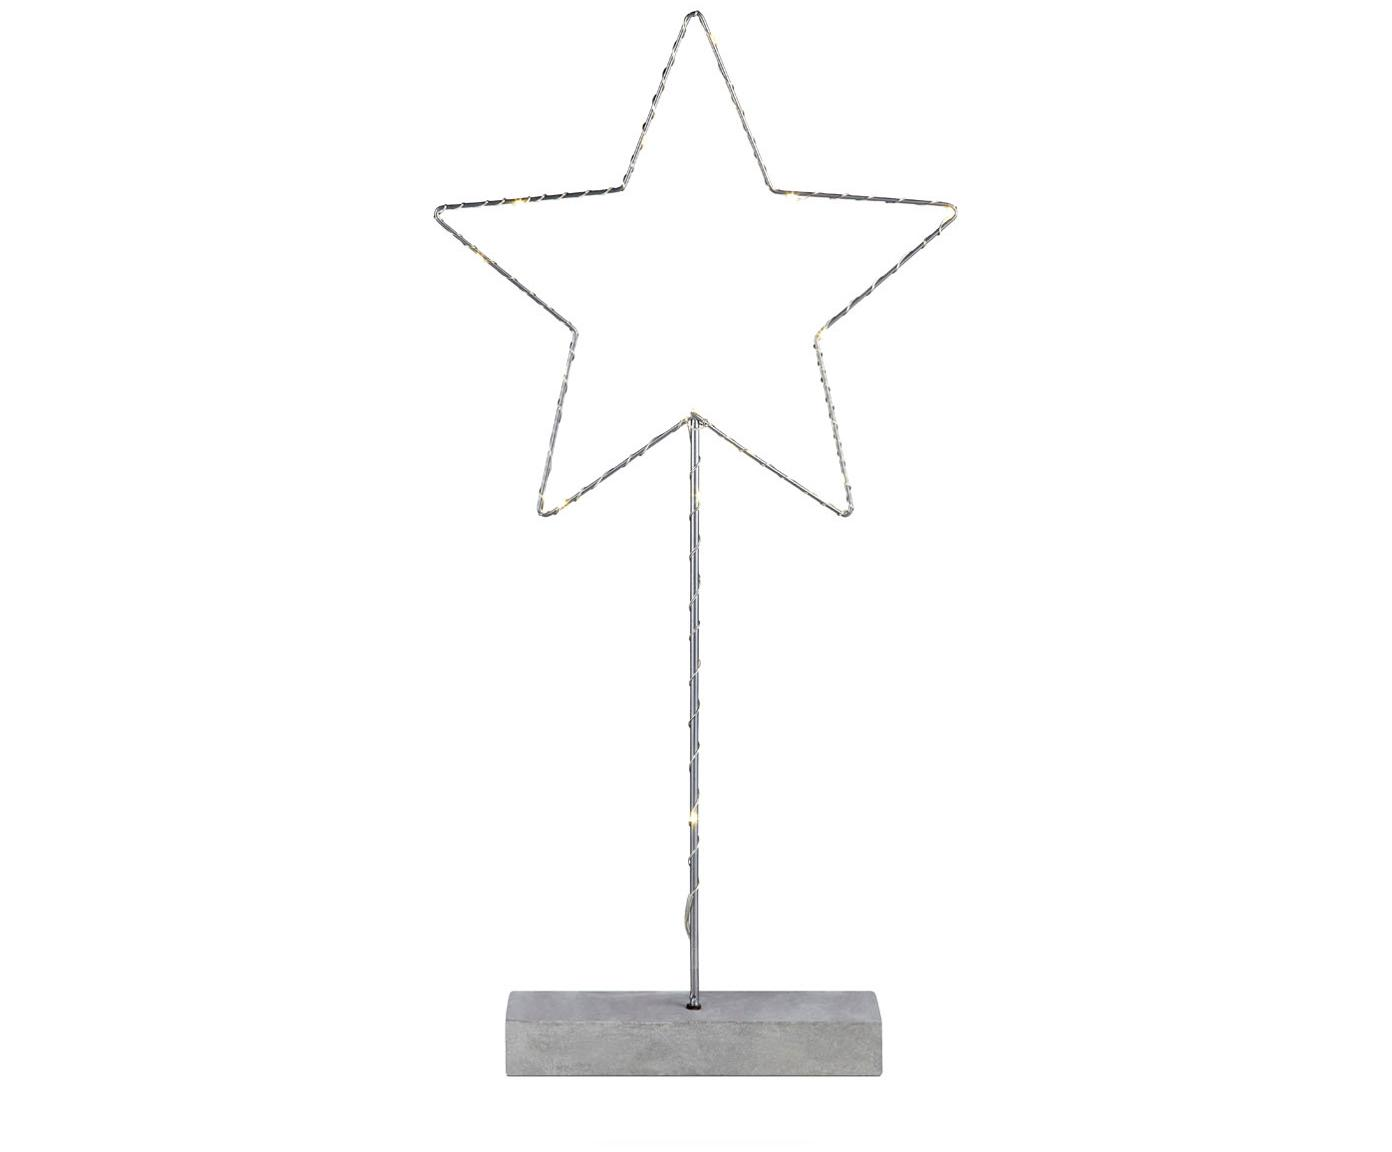 LED tafellamp Malin, Gelakt metaal, Grijs, 26 x 51 cm